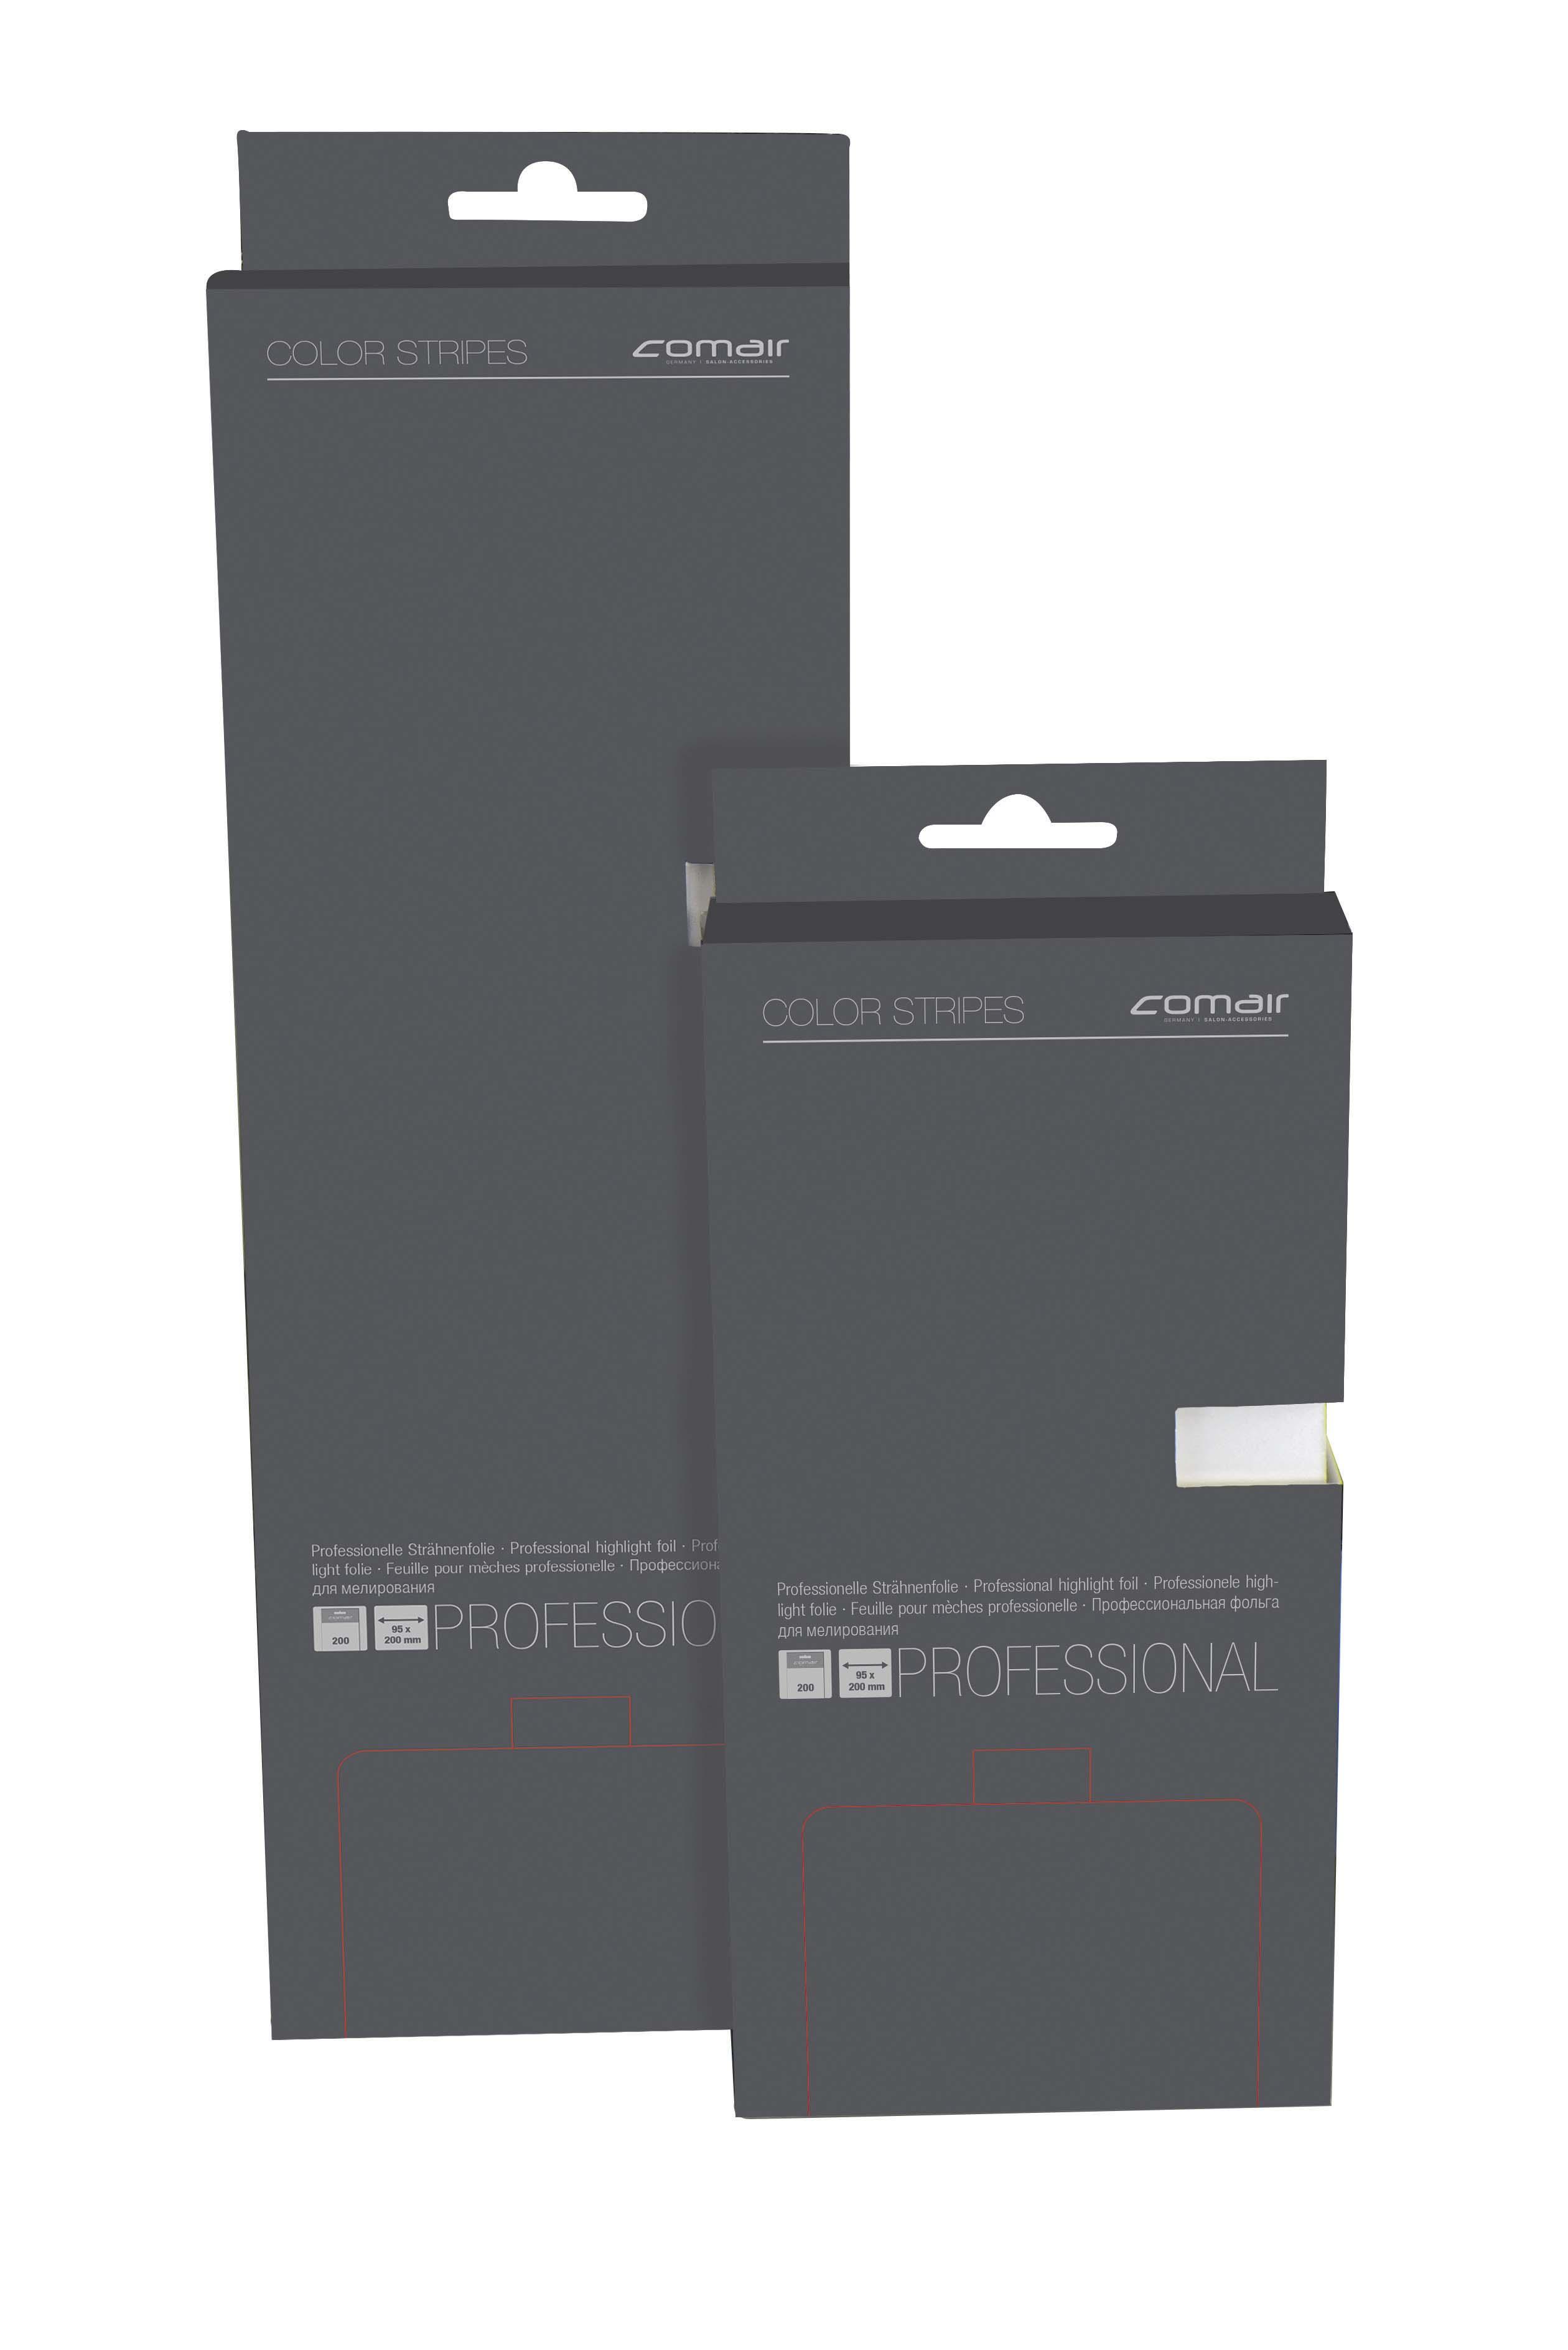 Color Stripes kurz 95x200 mm, 200 Stück silber